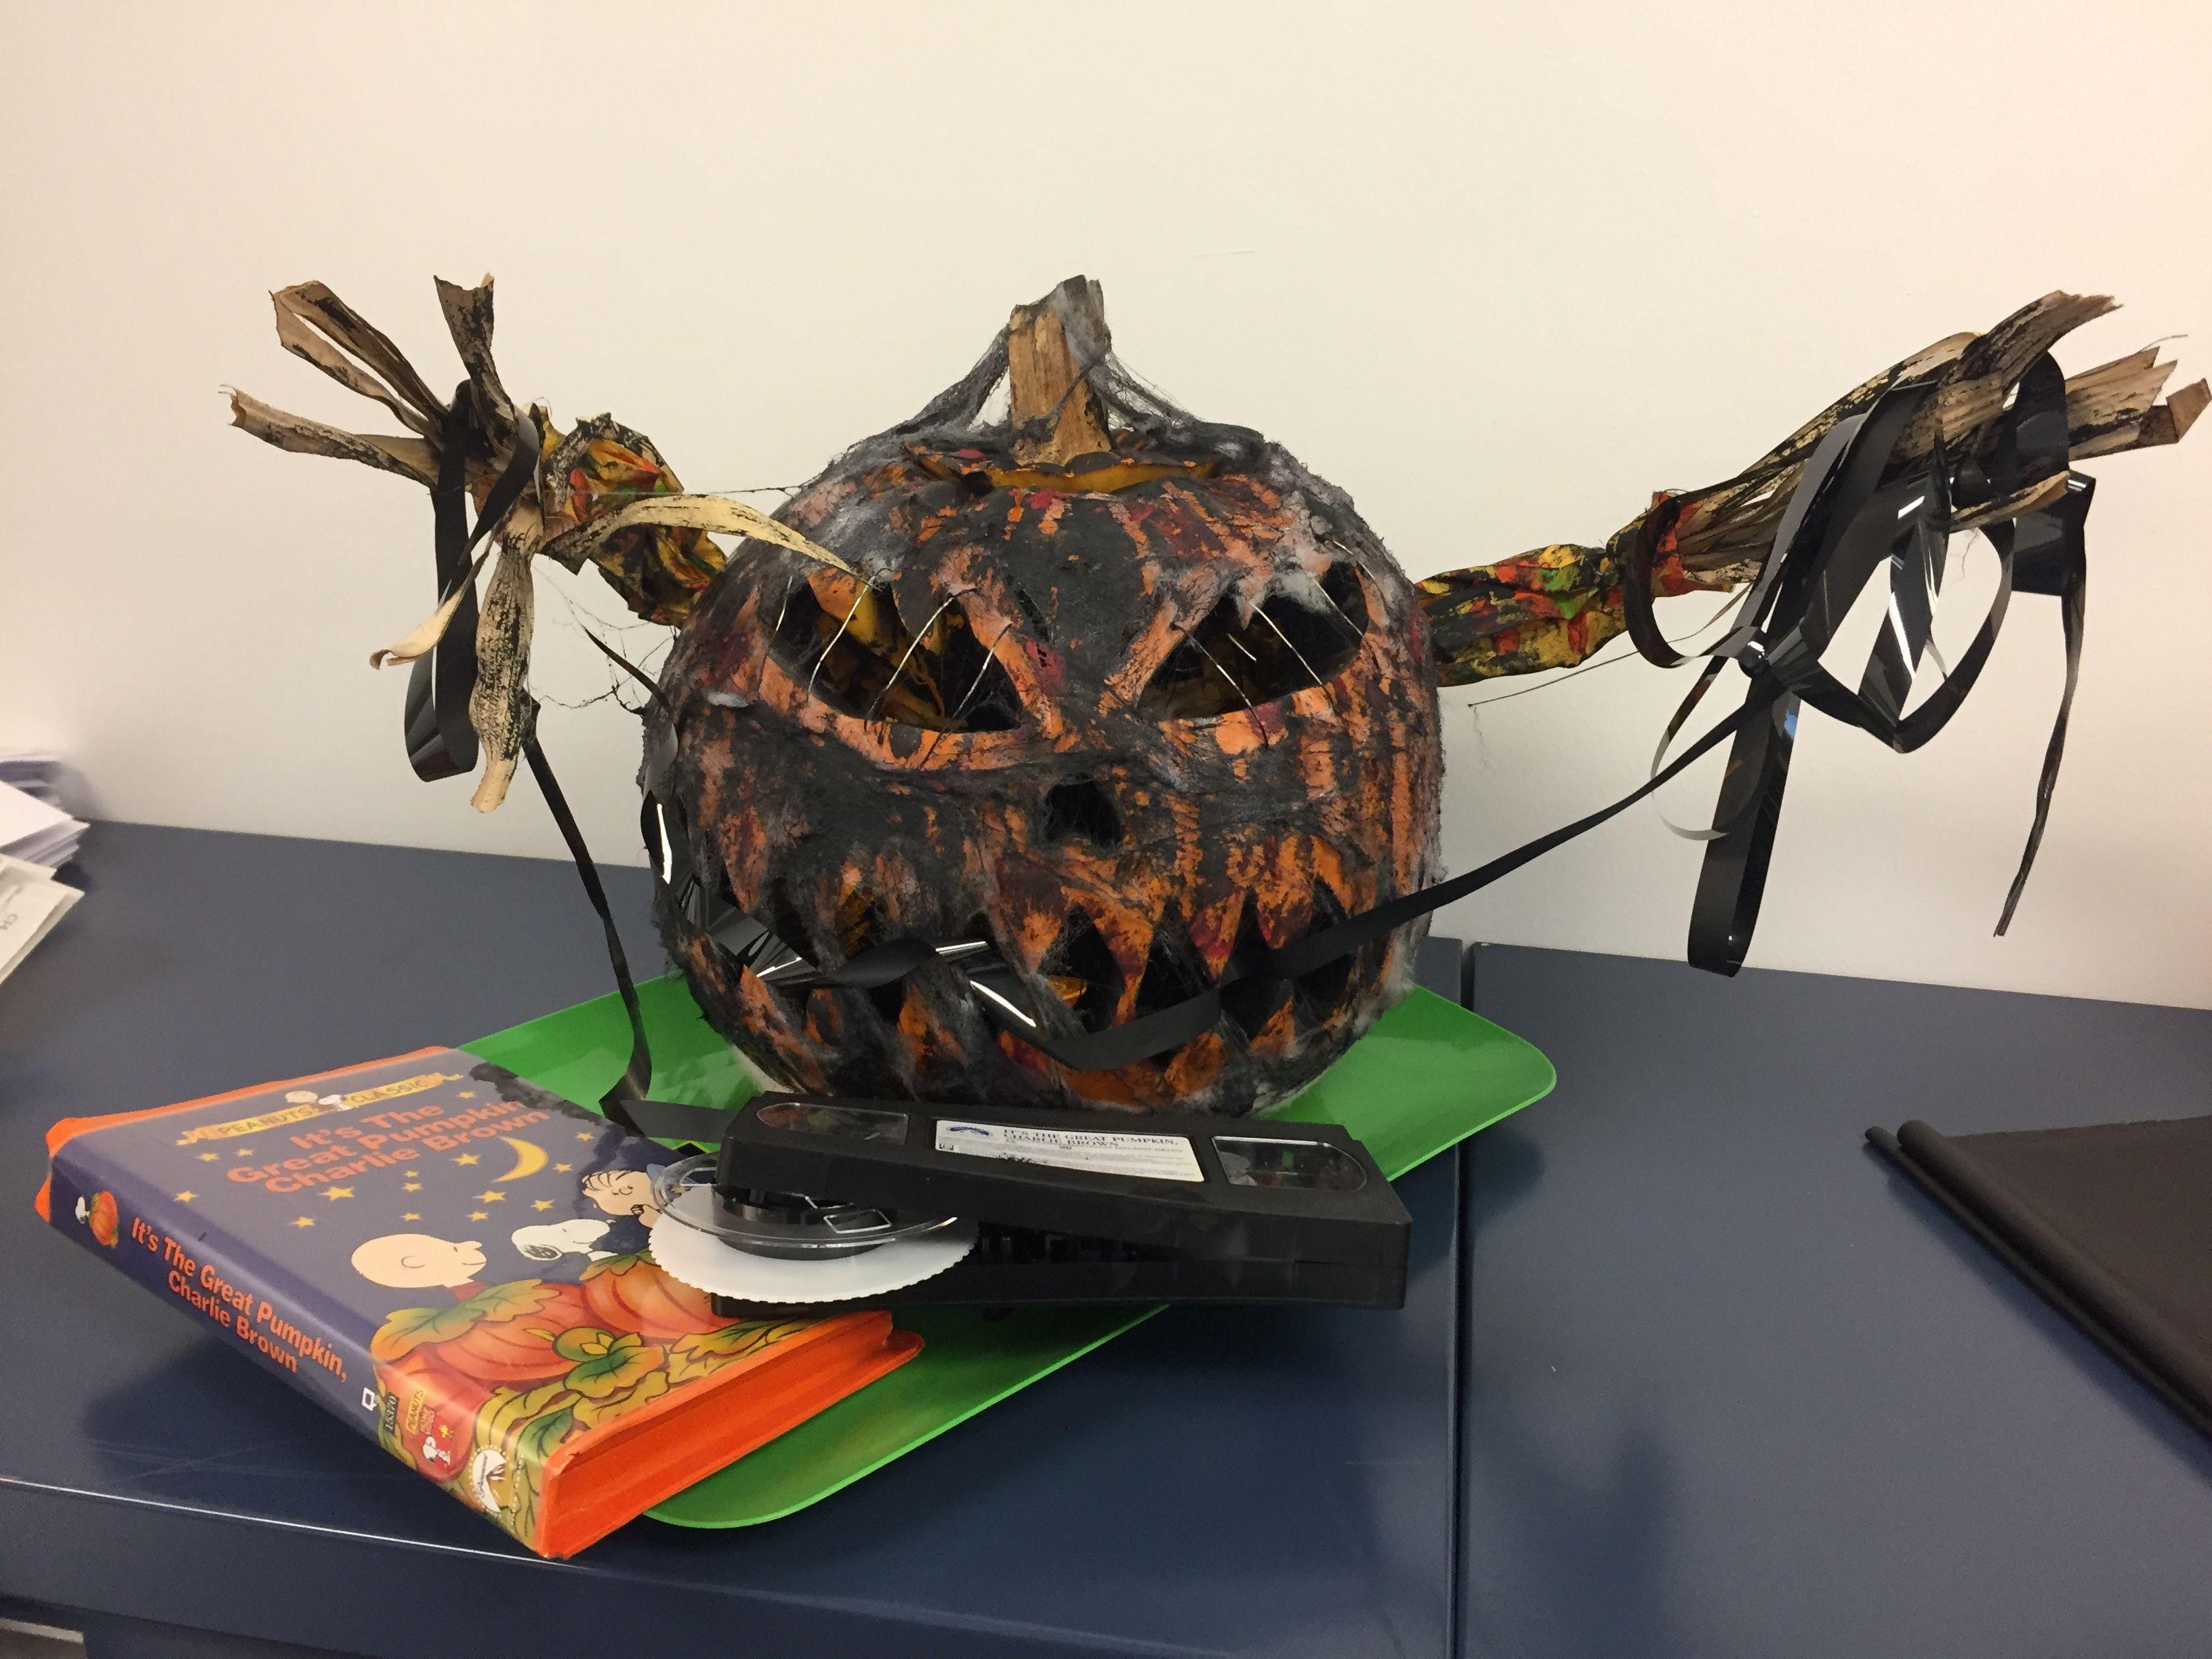 Burned pumpkin